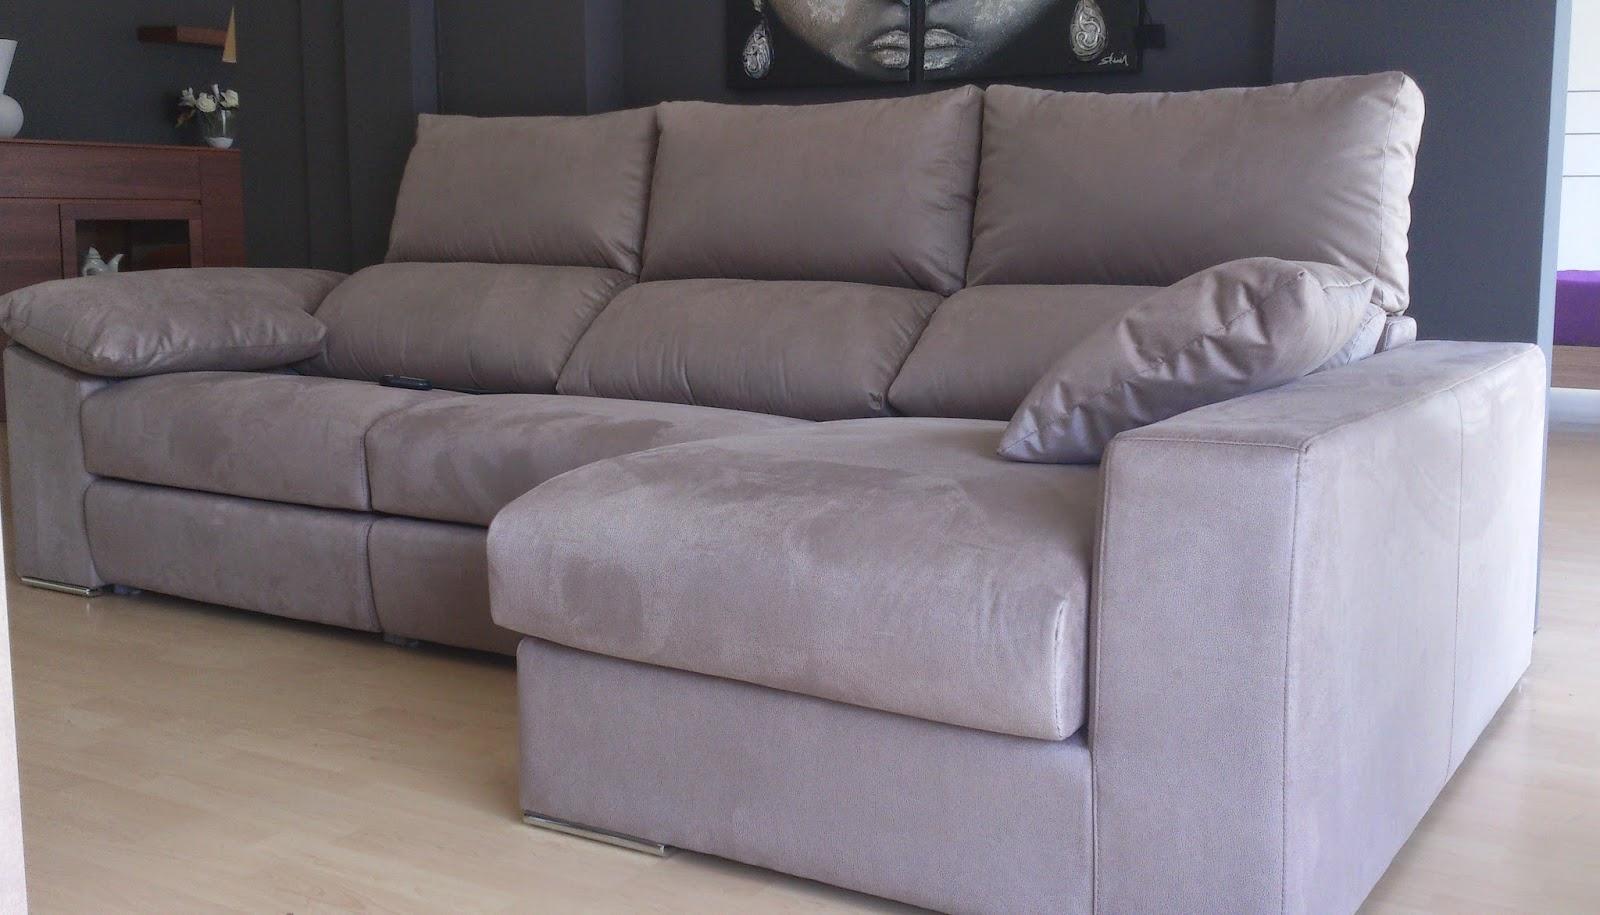 Sofas Granollers Gallery Of Un Sofa Para Tumbarse Granollers  # Muebles Roig Granollers